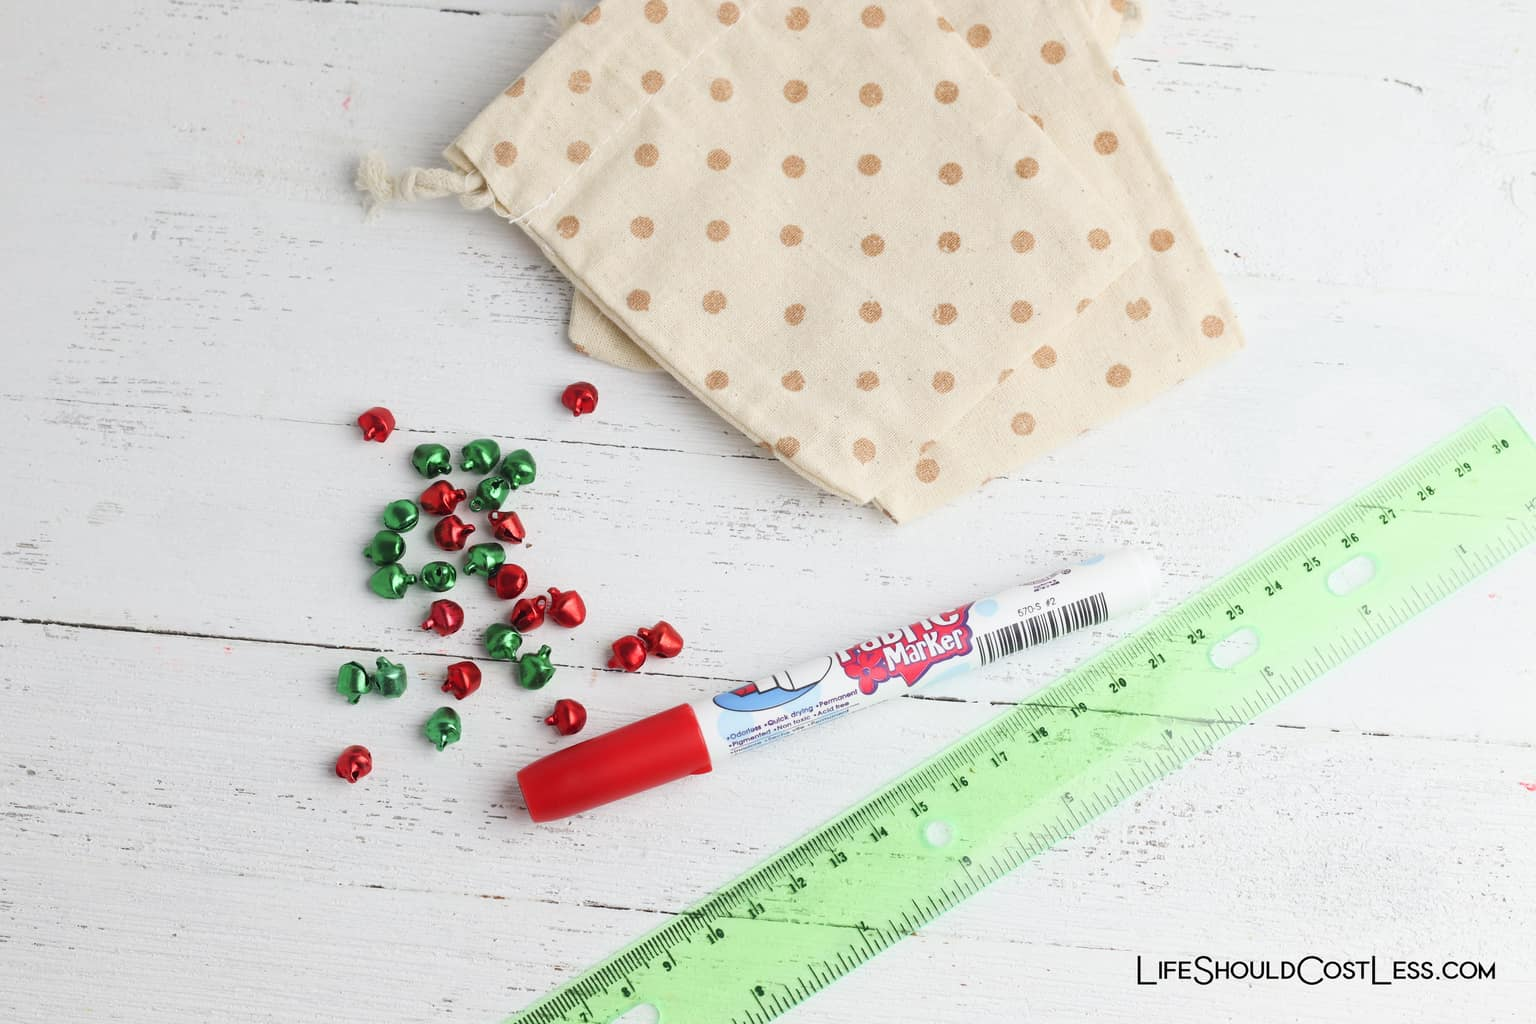 Easy Tic Tac Toe Game Christmas Kids Craft lifeshouldcostless.com